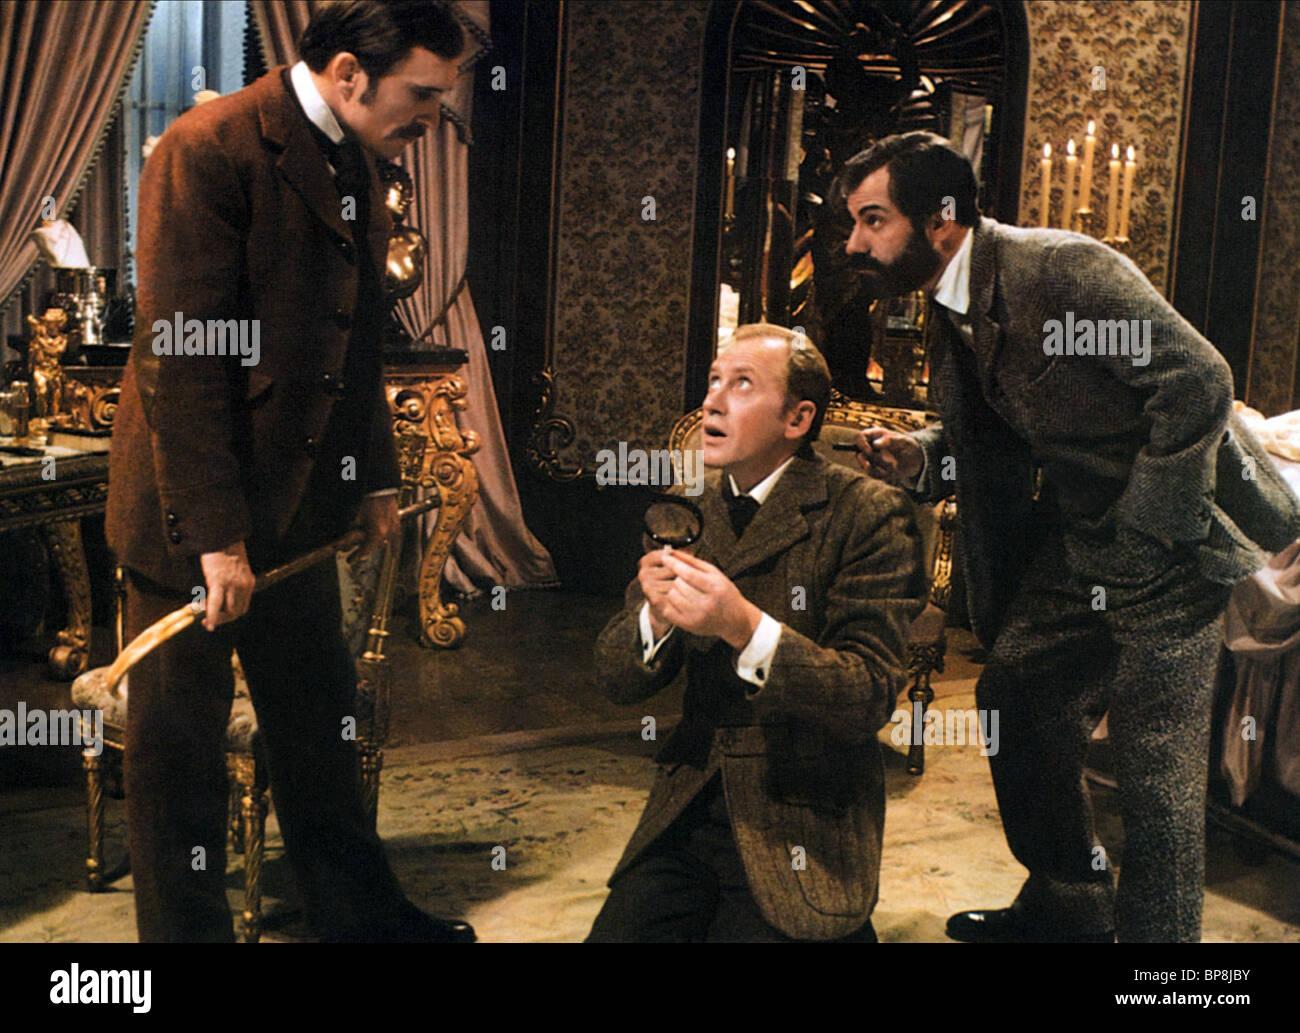 ROBERT DUVALL, NICOL WILLIAMSON, ALAN ARKIN, THE SEVEN-PER-CENT SOLUTION, 1976 - Stock Image